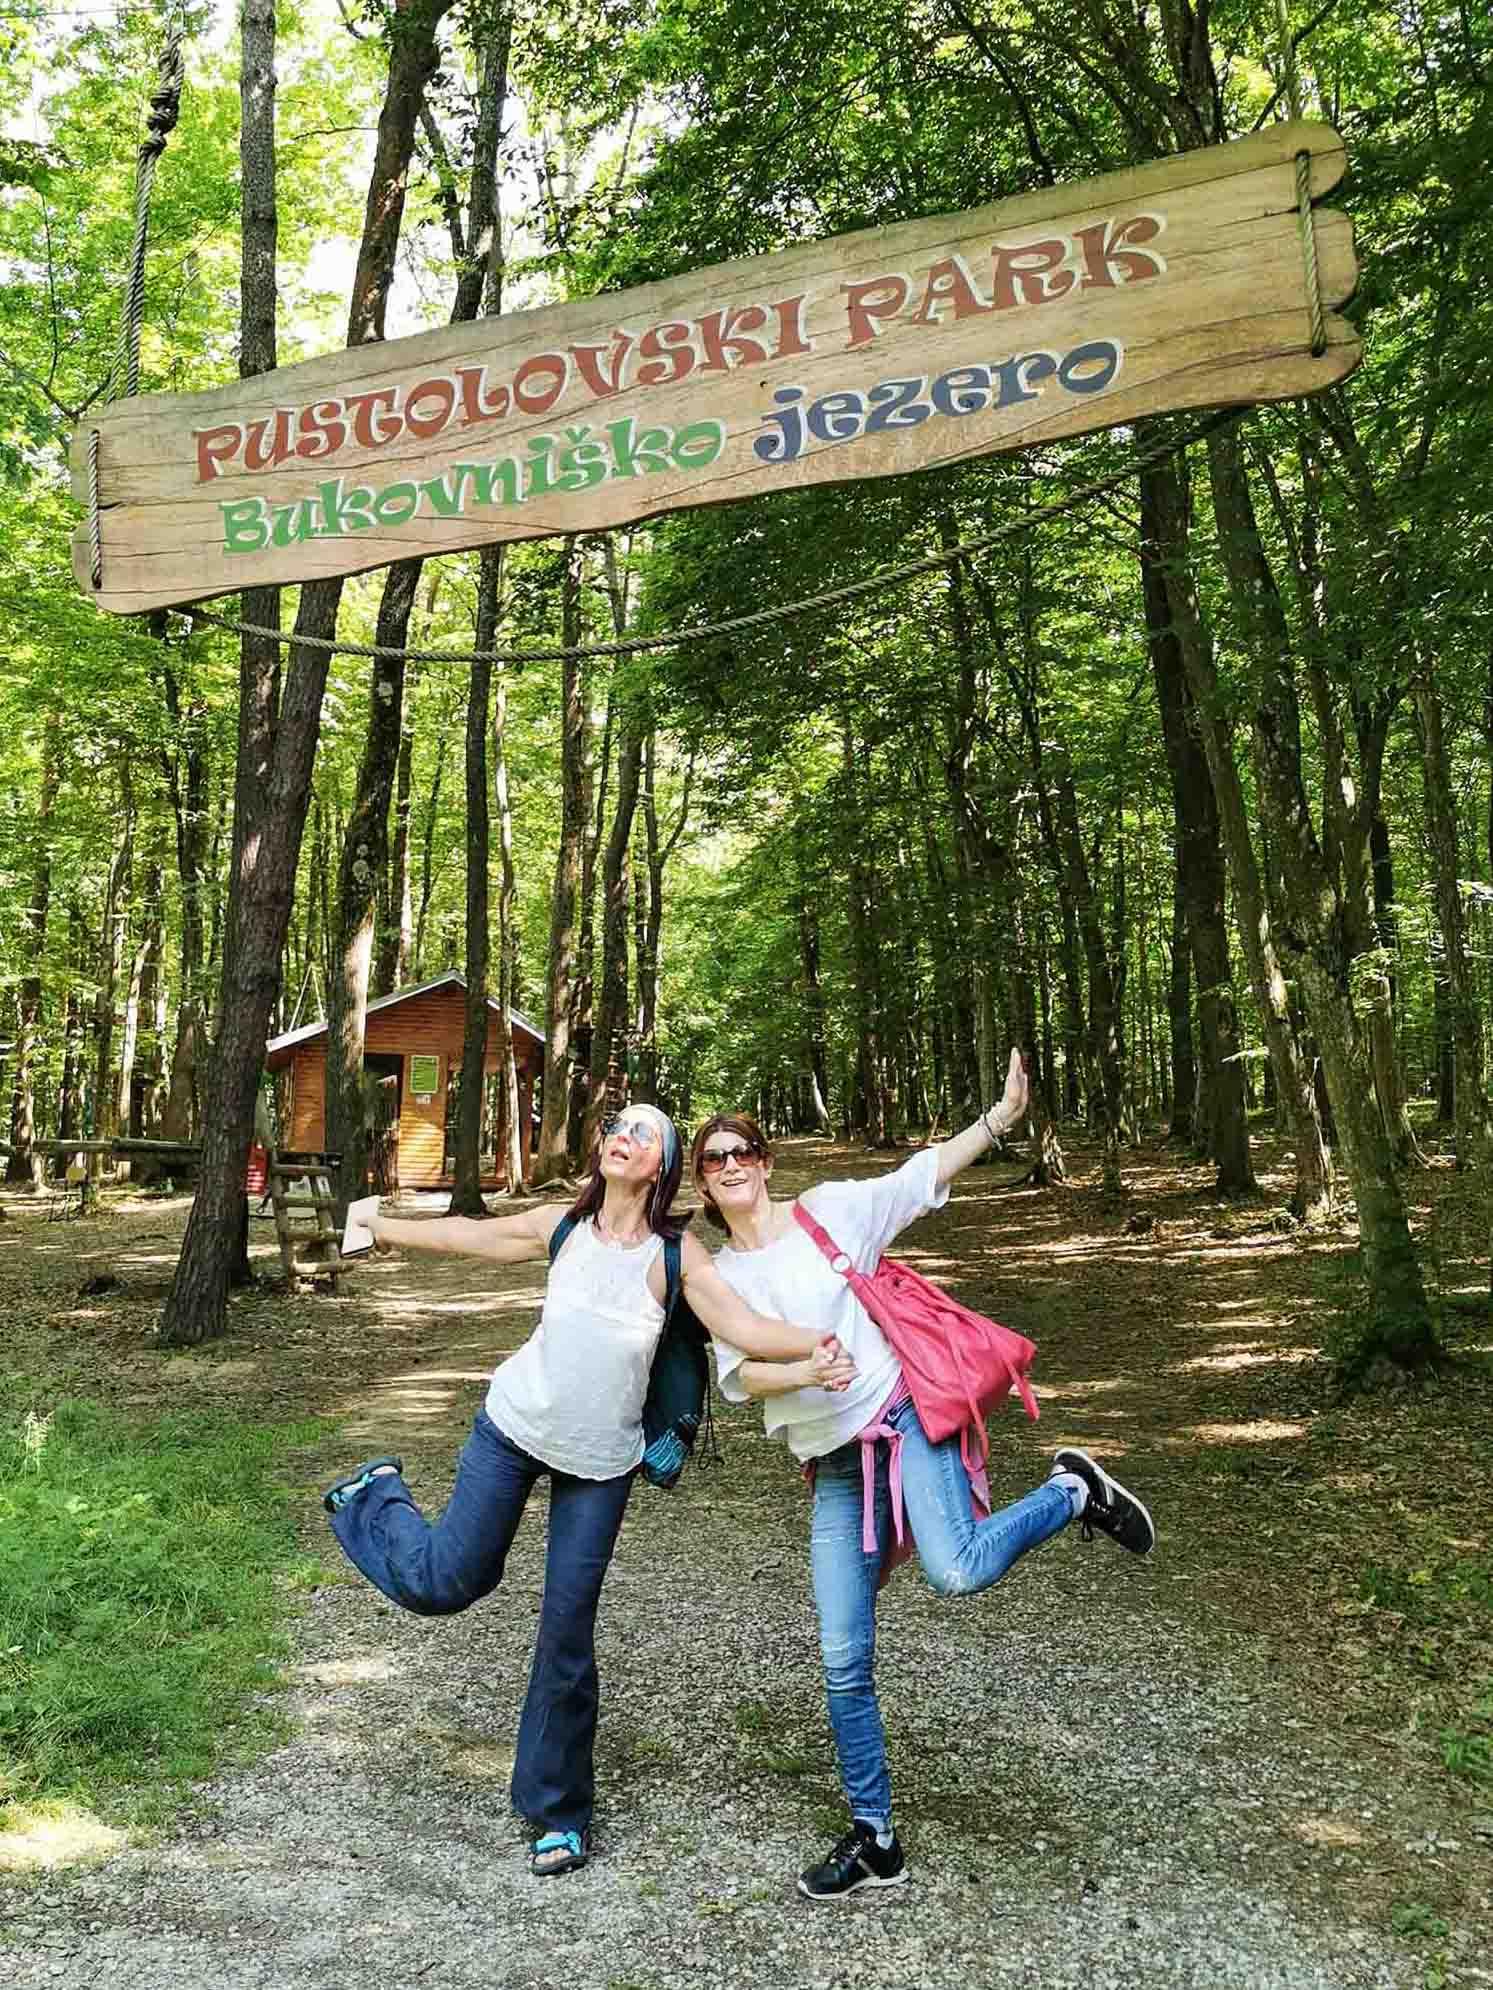 Pustolovski park - Bukovniško jezero